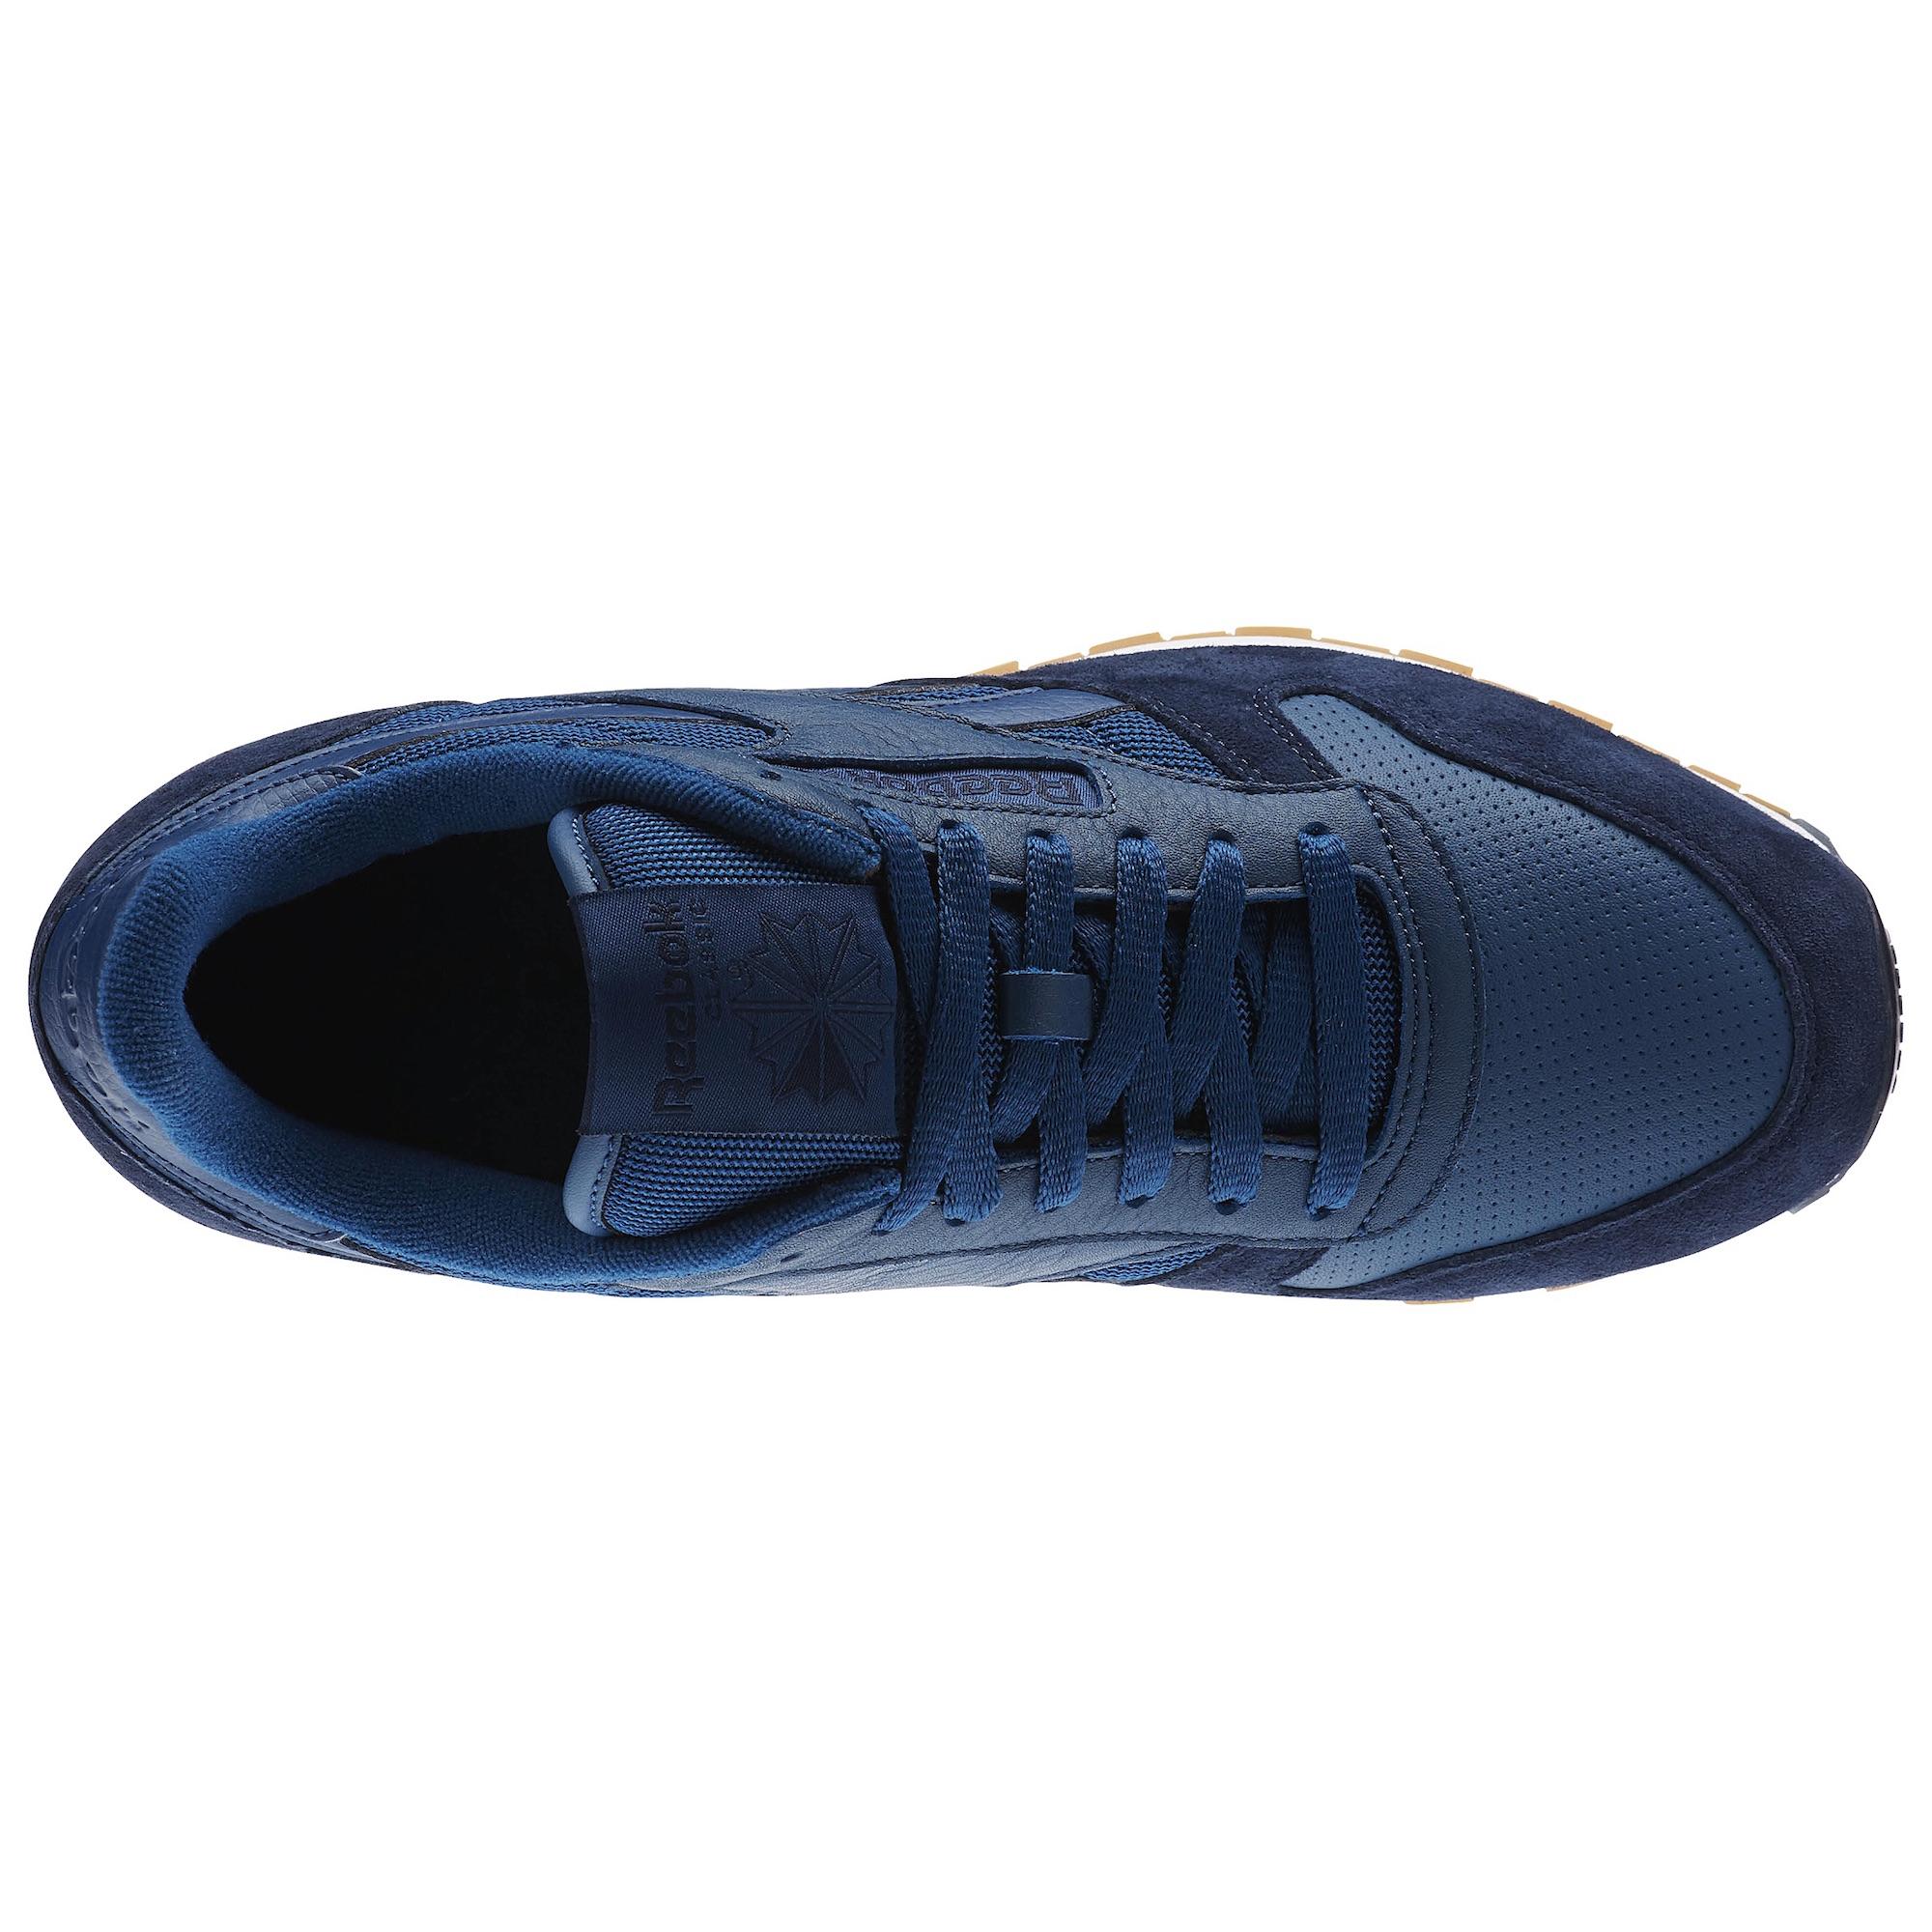 3ed0d16a42c kendrick lamar x reebok classic leather perfect split 8 - WearTesters